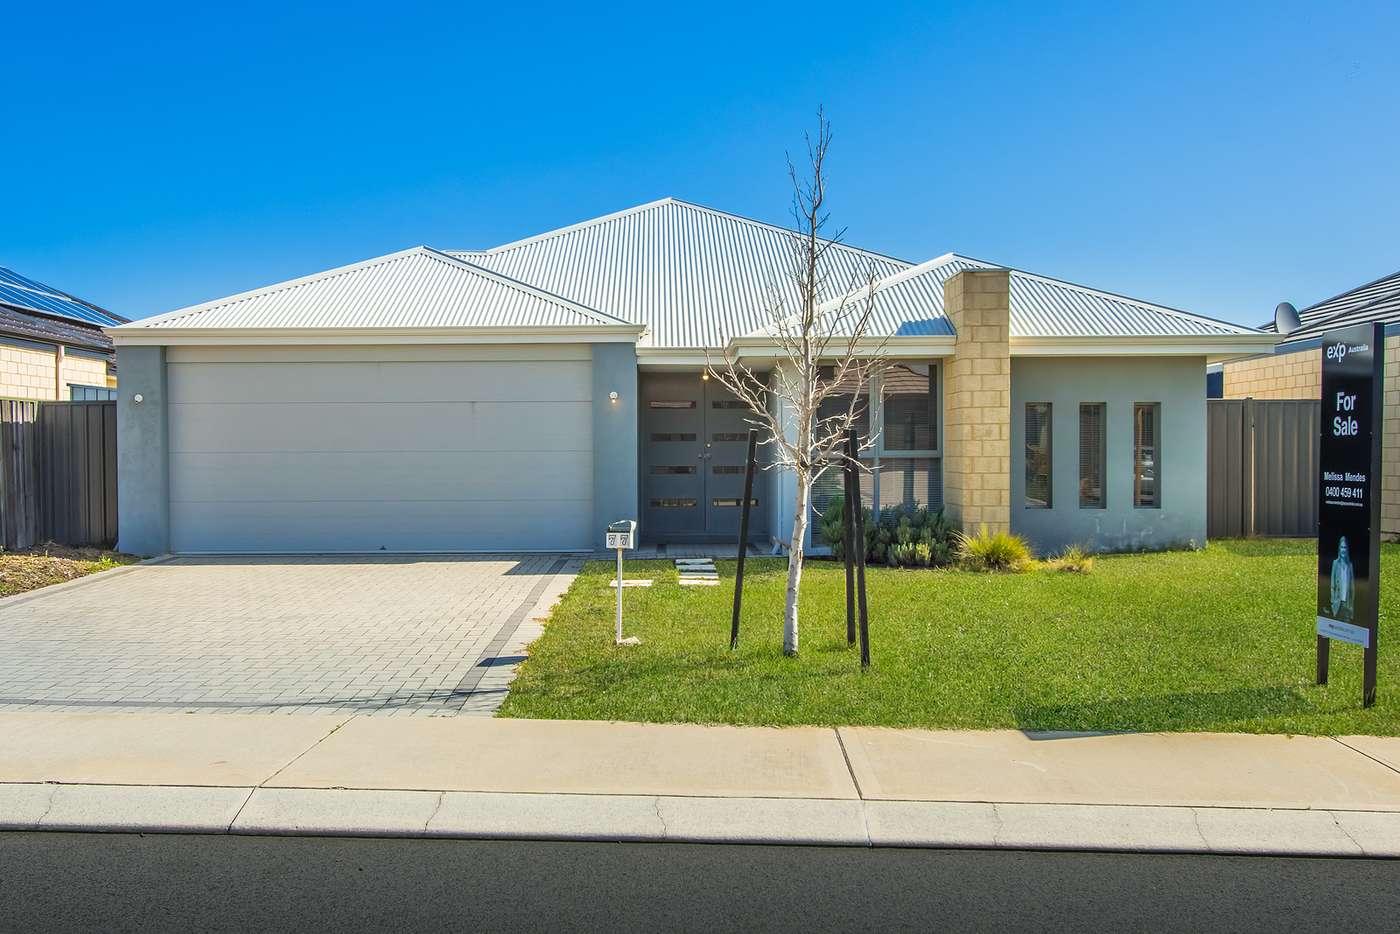 Main view of Homely house listing, 77 Sapphire Chase, Wellard WA 6170